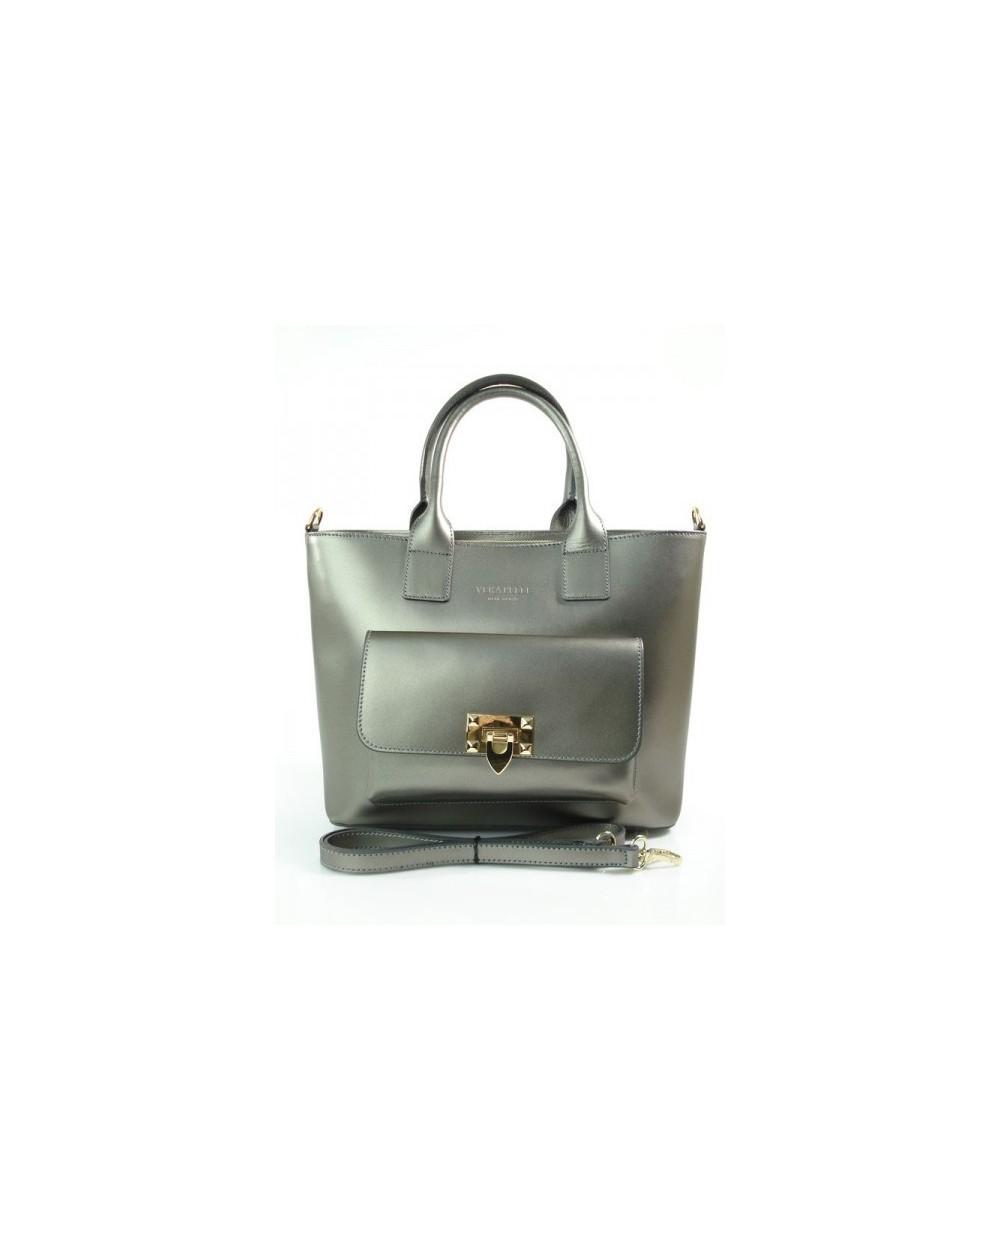 Pojemny damski kuferek ze skóry srebrny metaliczny